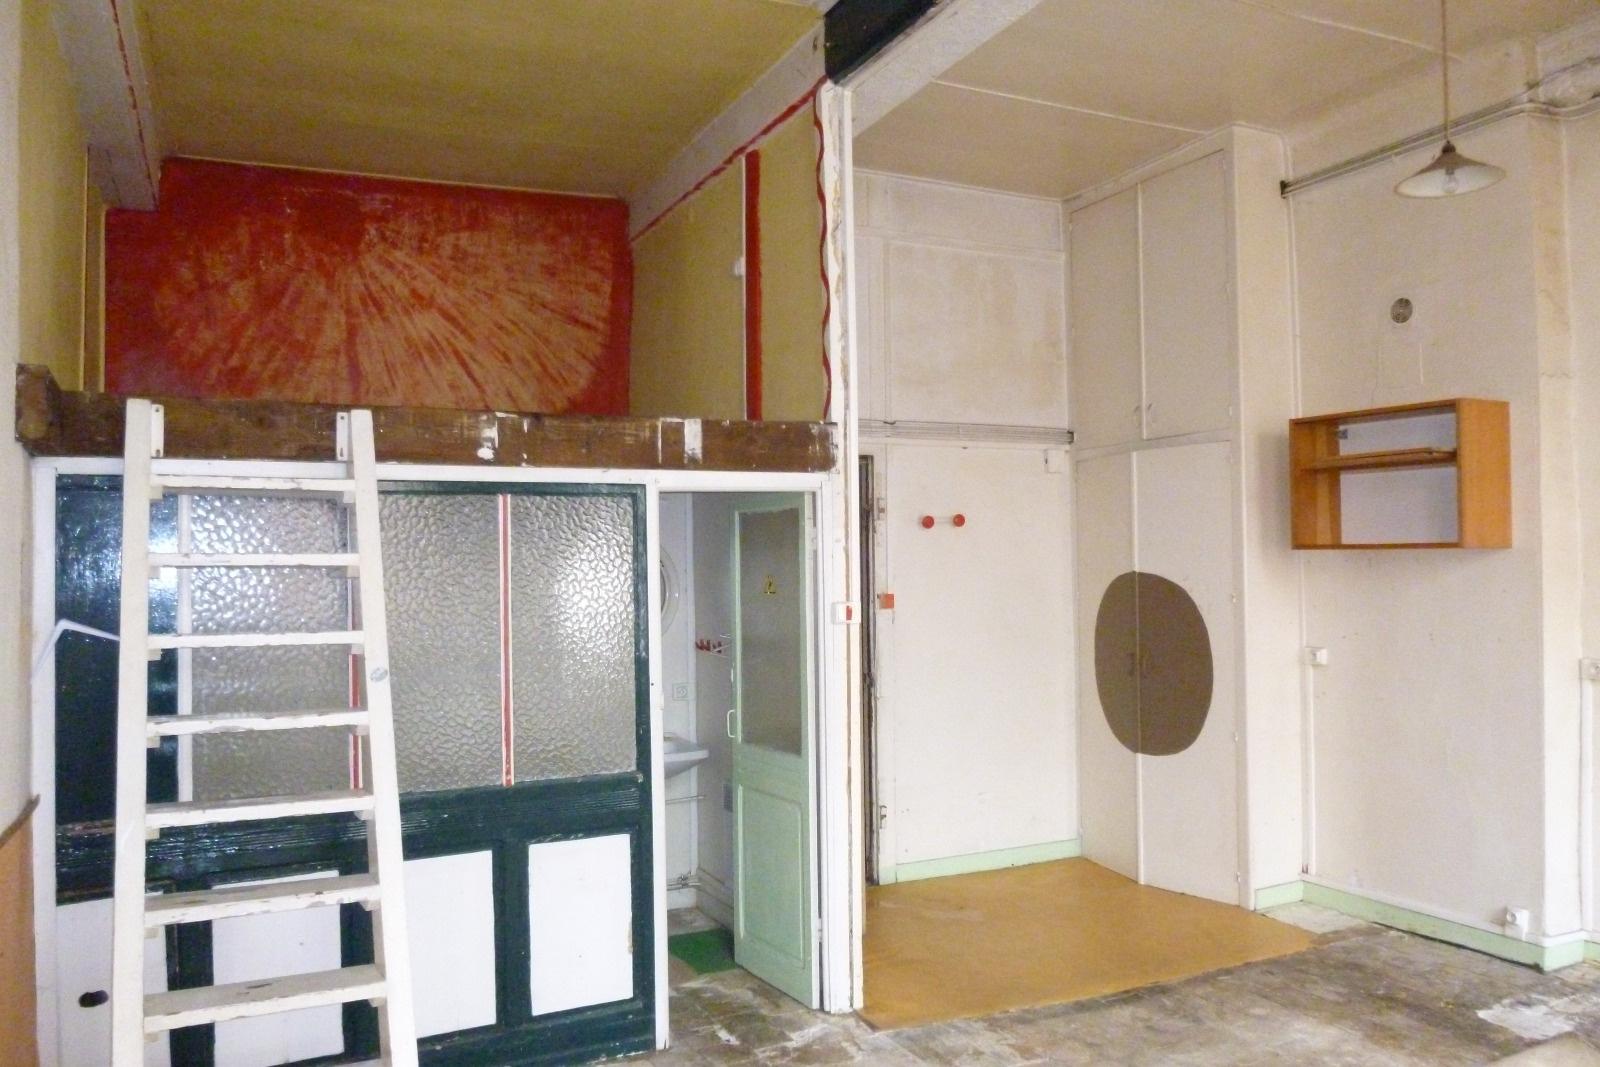 vente appartement lyon lyon 69000. Black Bedroom Furniture Sets. Home Design Ideas